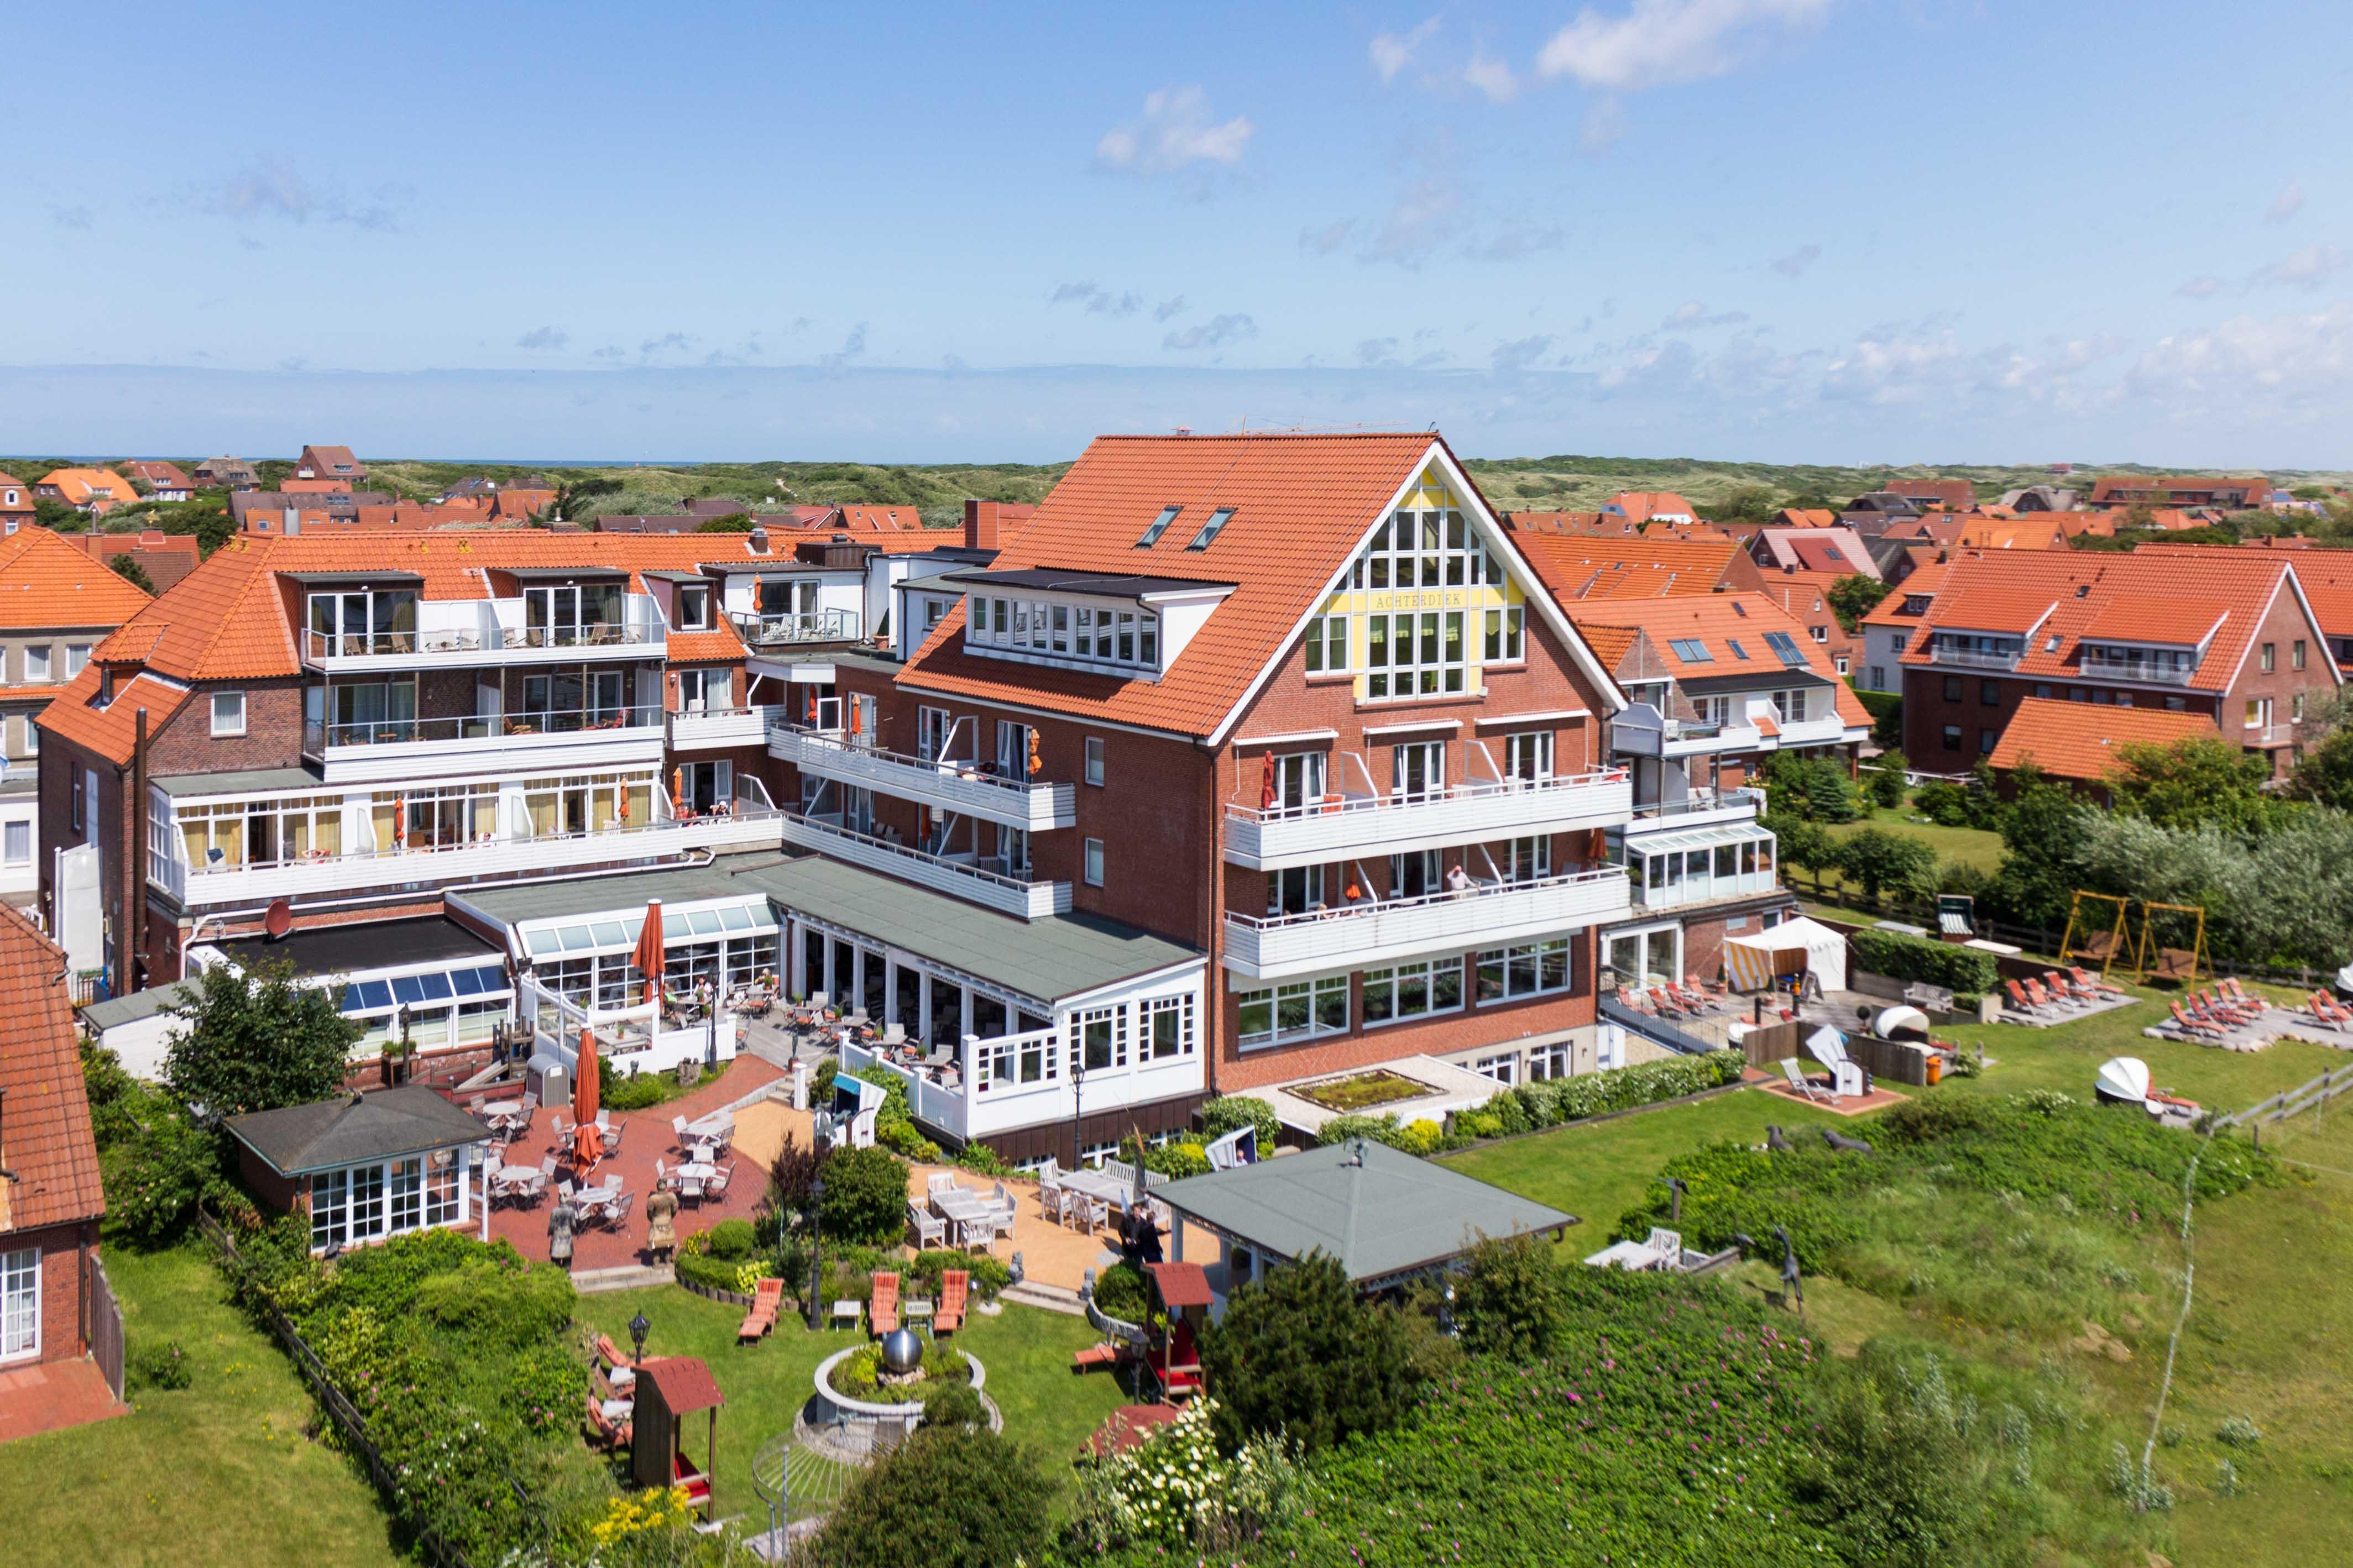 Romantik wellness hotel achterdiek nationalpark for Juist unterkunft gunstig